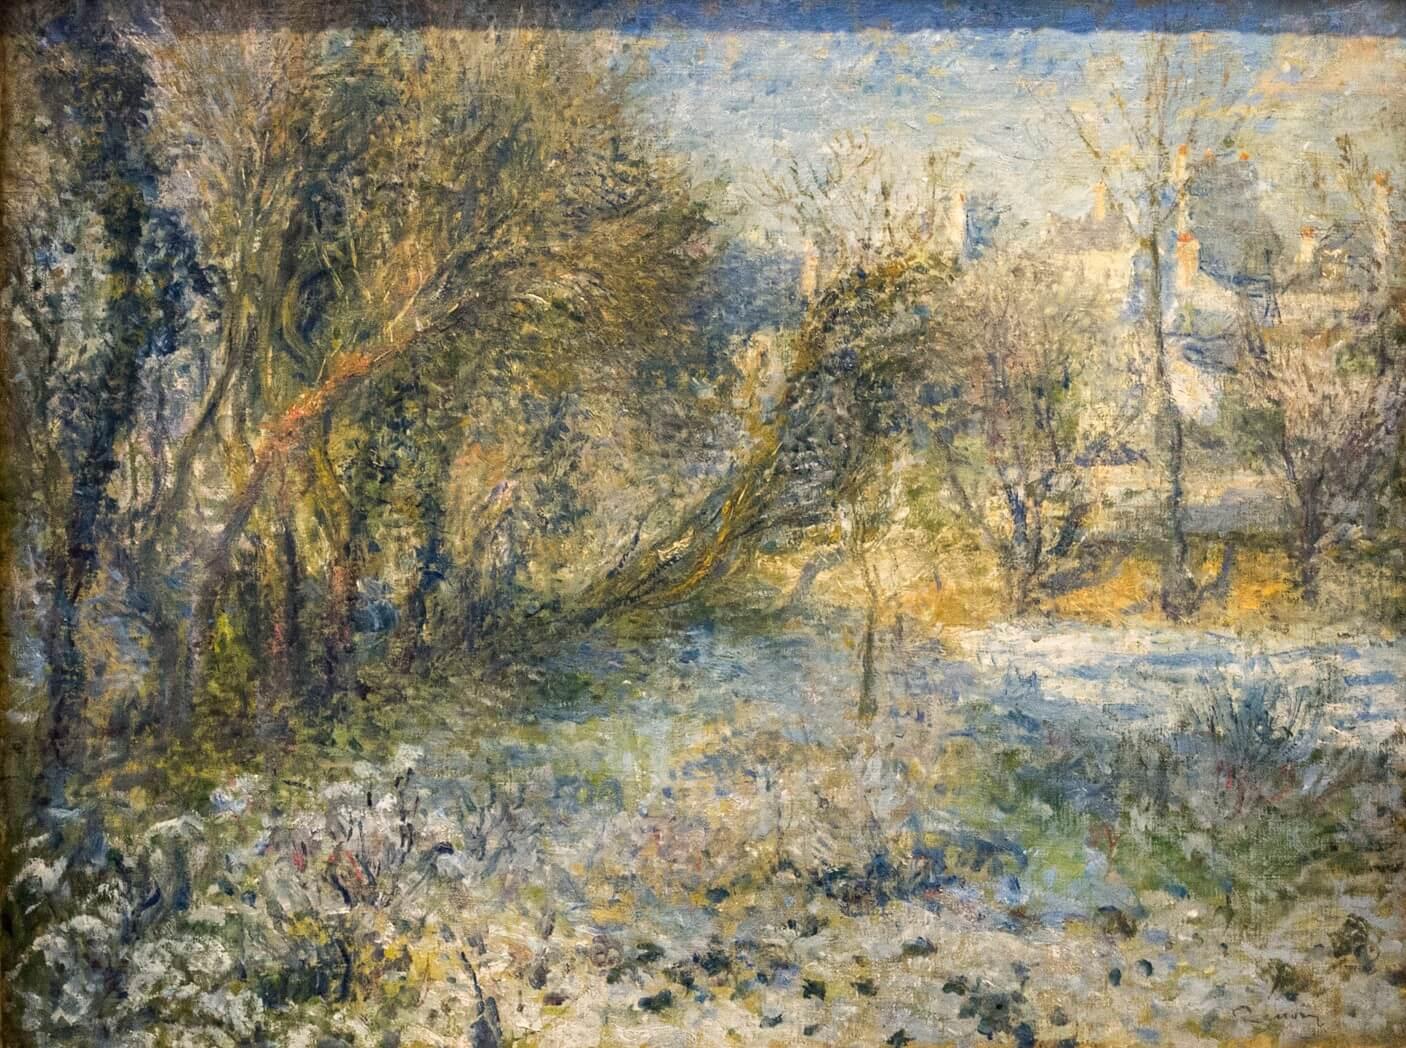 Pierre-Auguste Renoir, Schneelandschaft (1875)